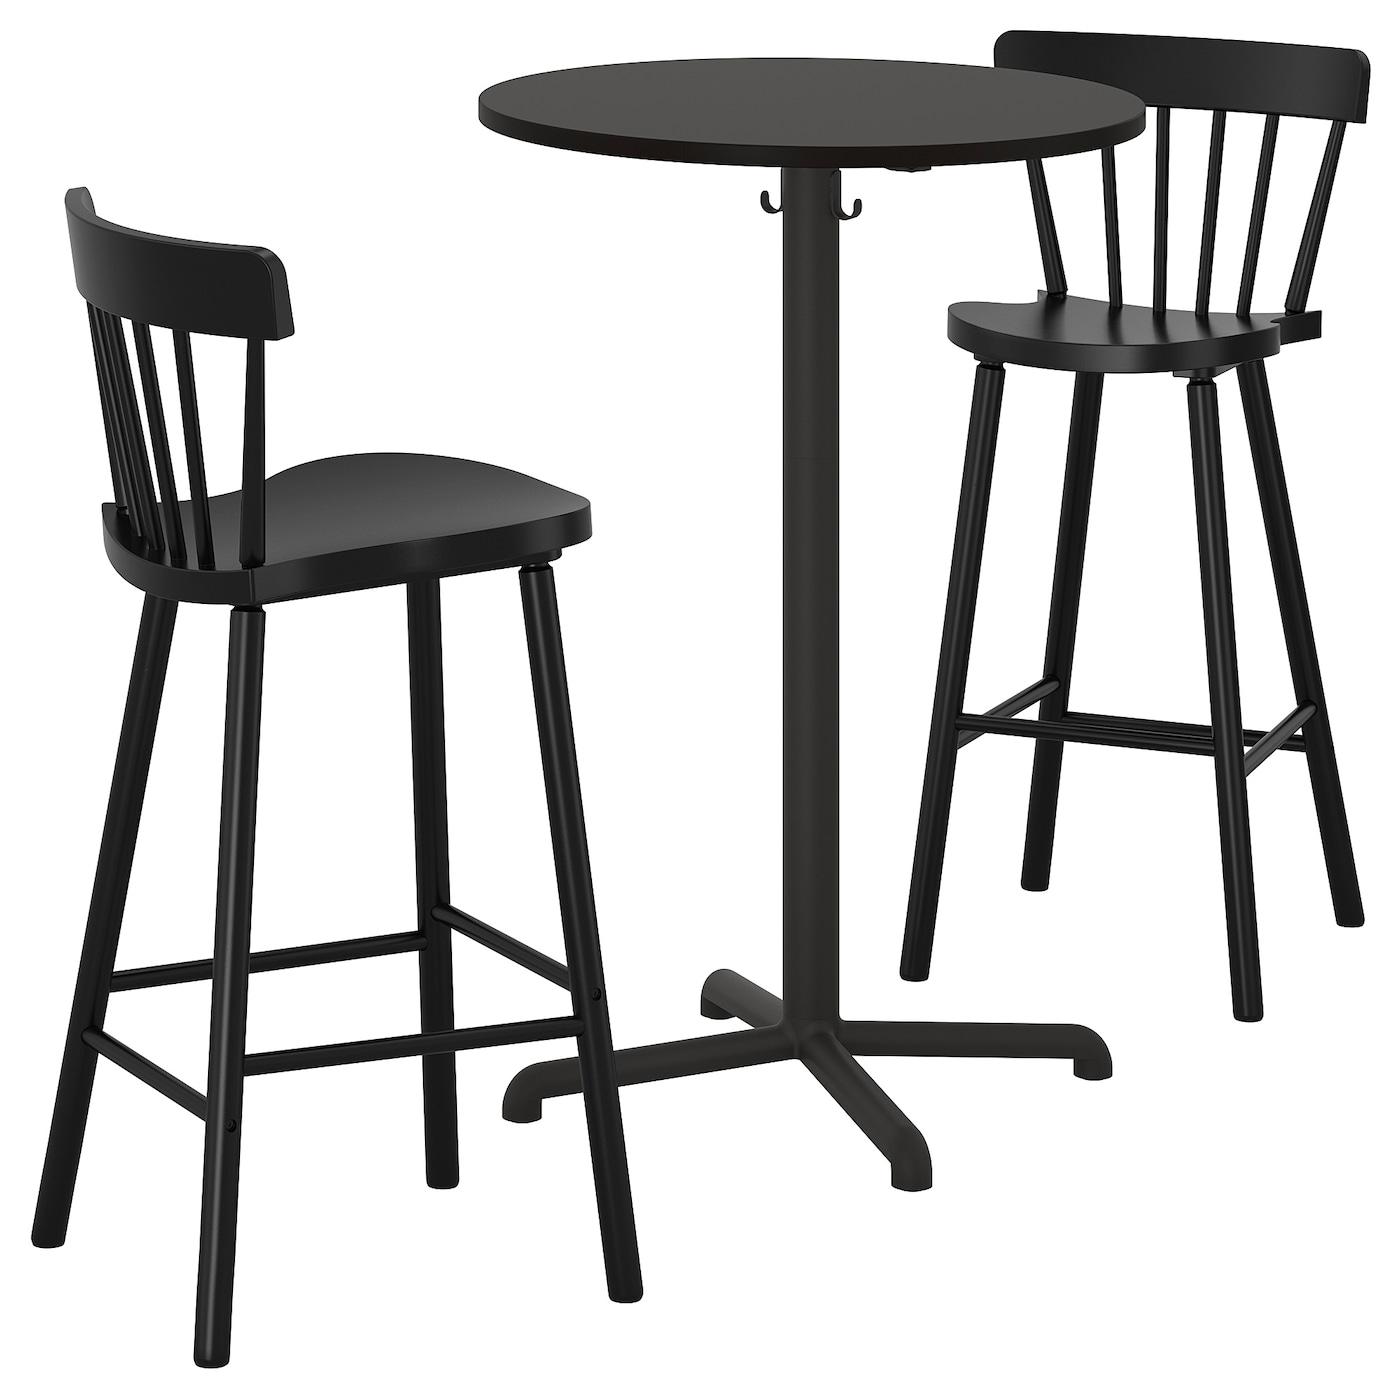 Surprising Stensele Norraryd Bar Table And 2 Bar Stools Anthracite Anthracite Black Creativecarmelina Interior Chair Design Creativecarmelinacom